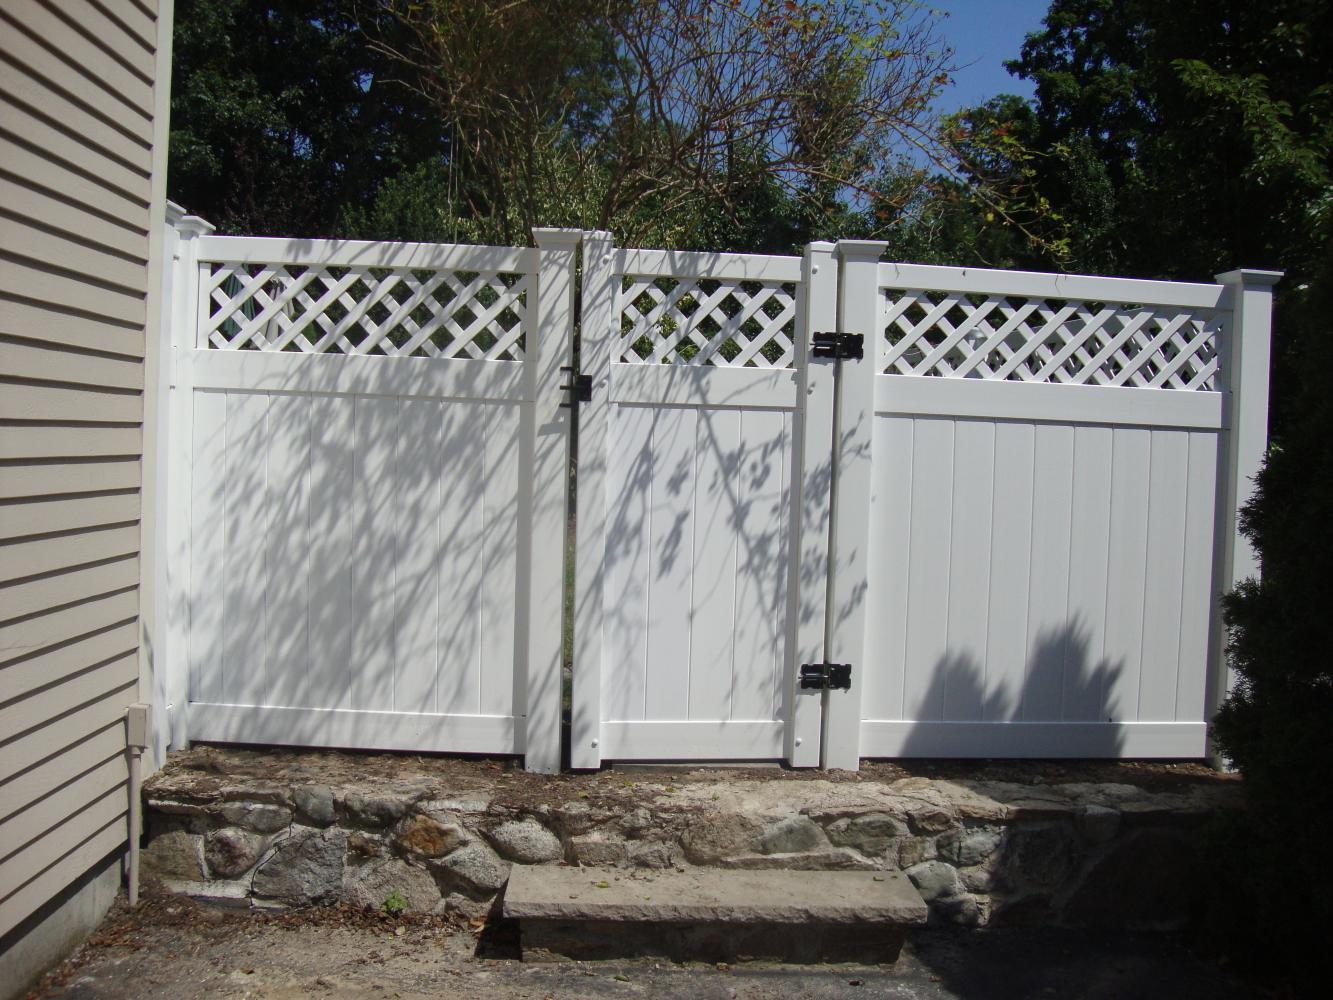 6u2032 high white vinyl diamond lattice top style fence with gate